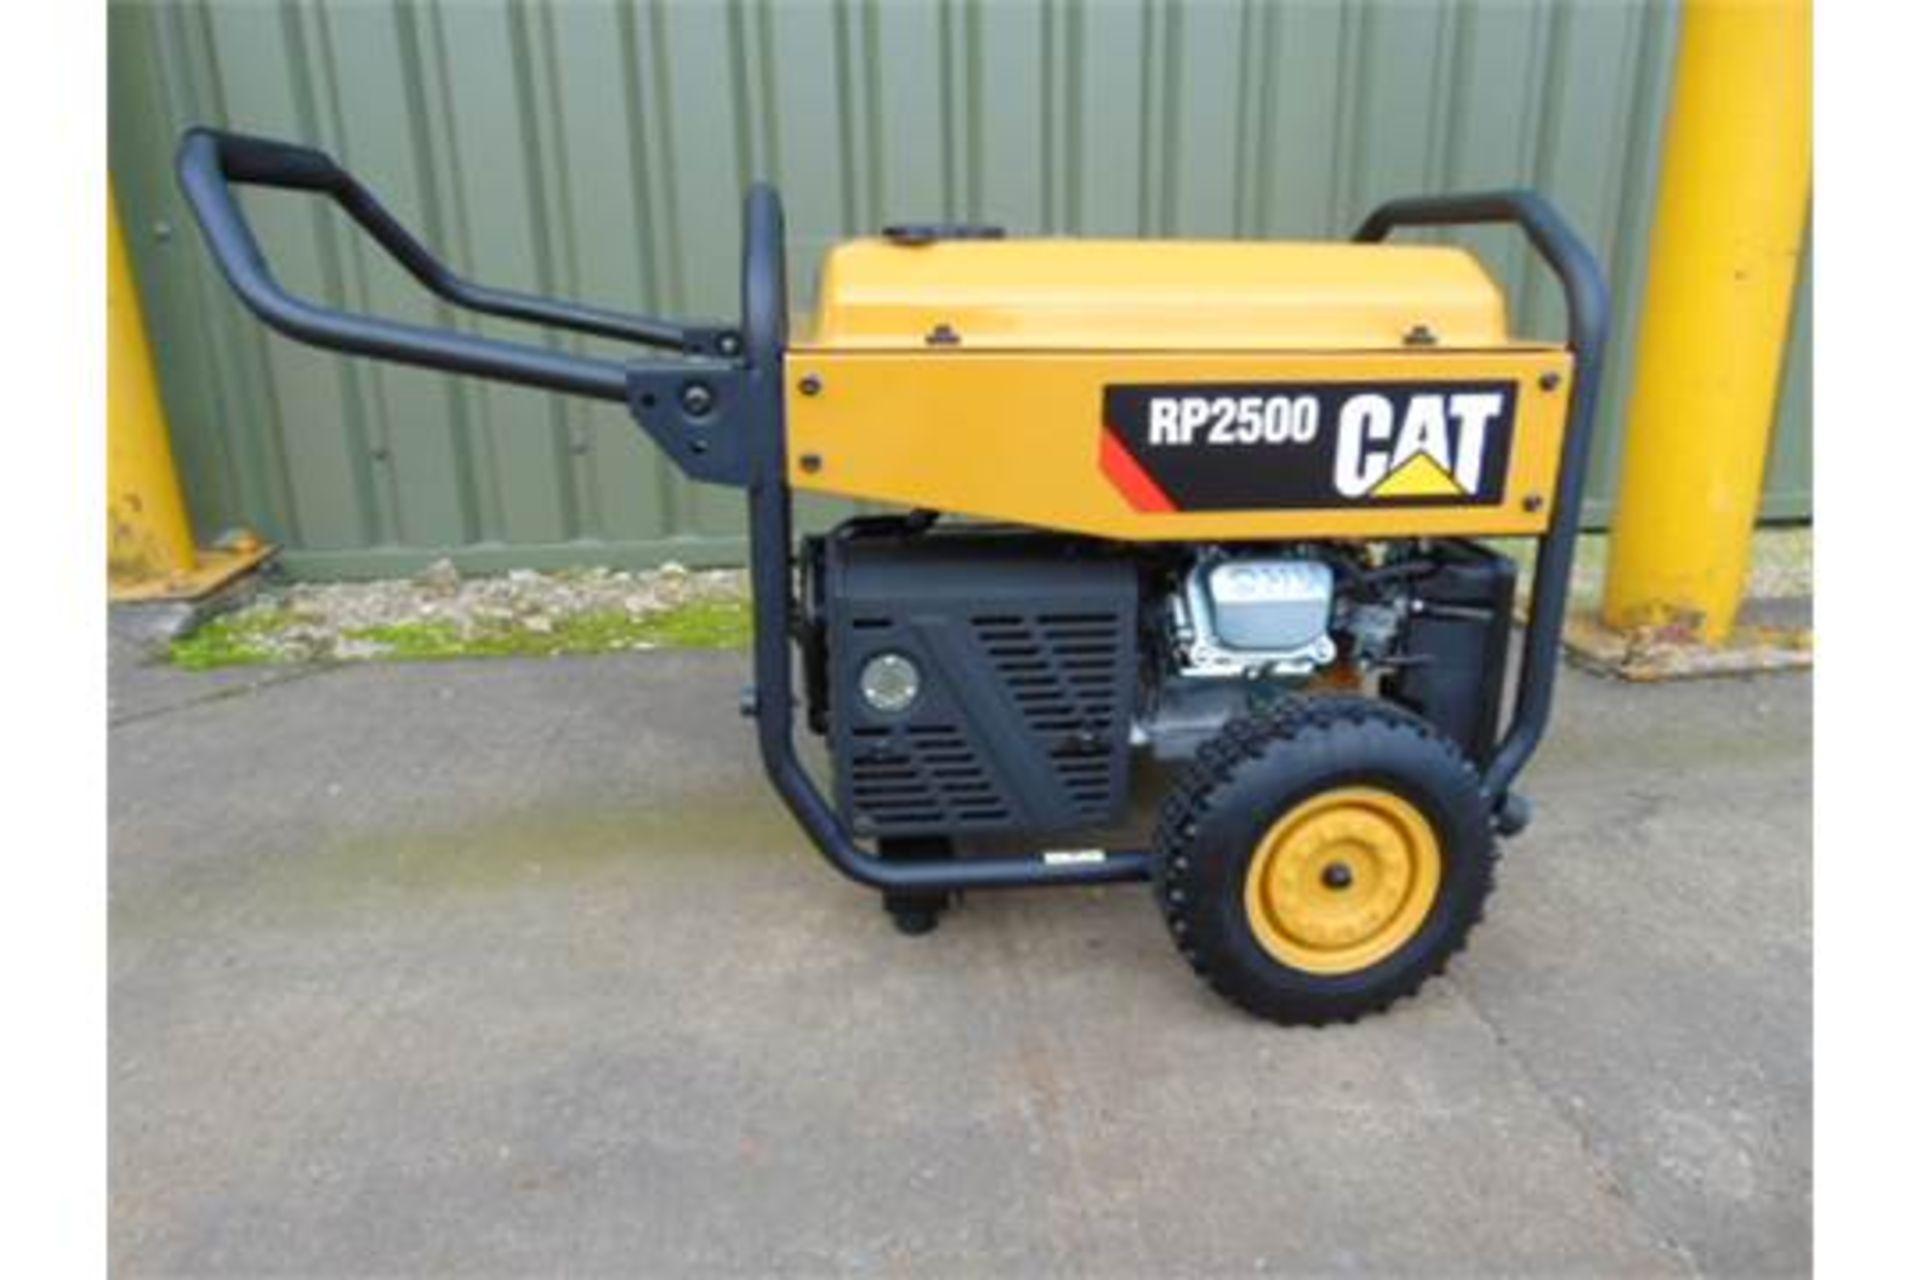 Lot 42 - UNISSUED Caterpillar RP2500 Industrial Petrol Generator Set